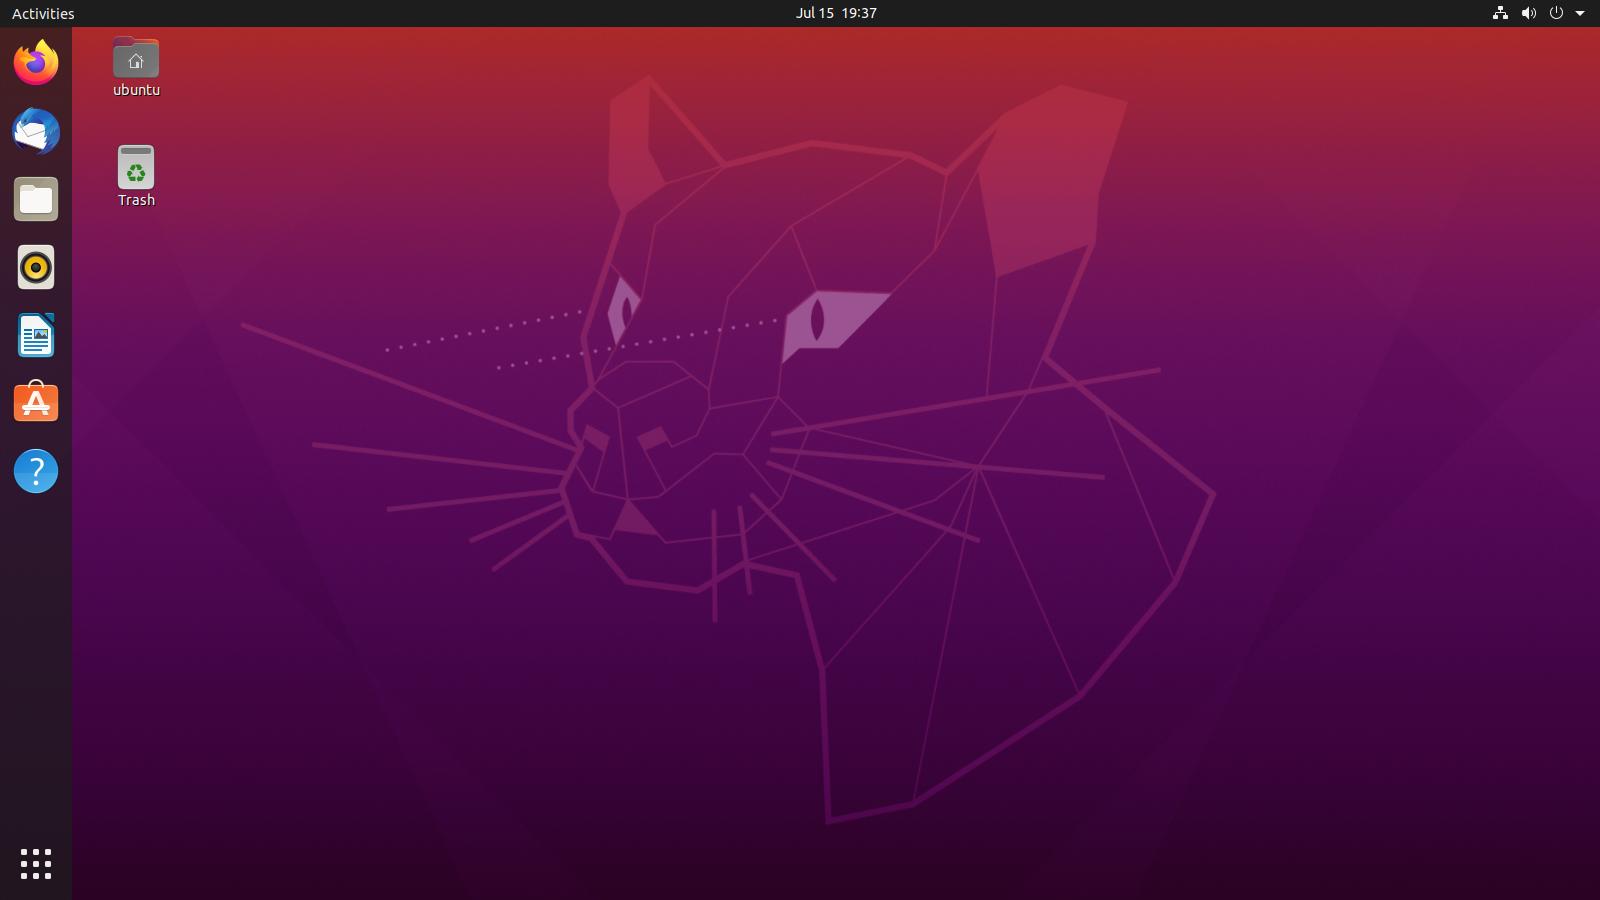 ubuntu-decryptinfo